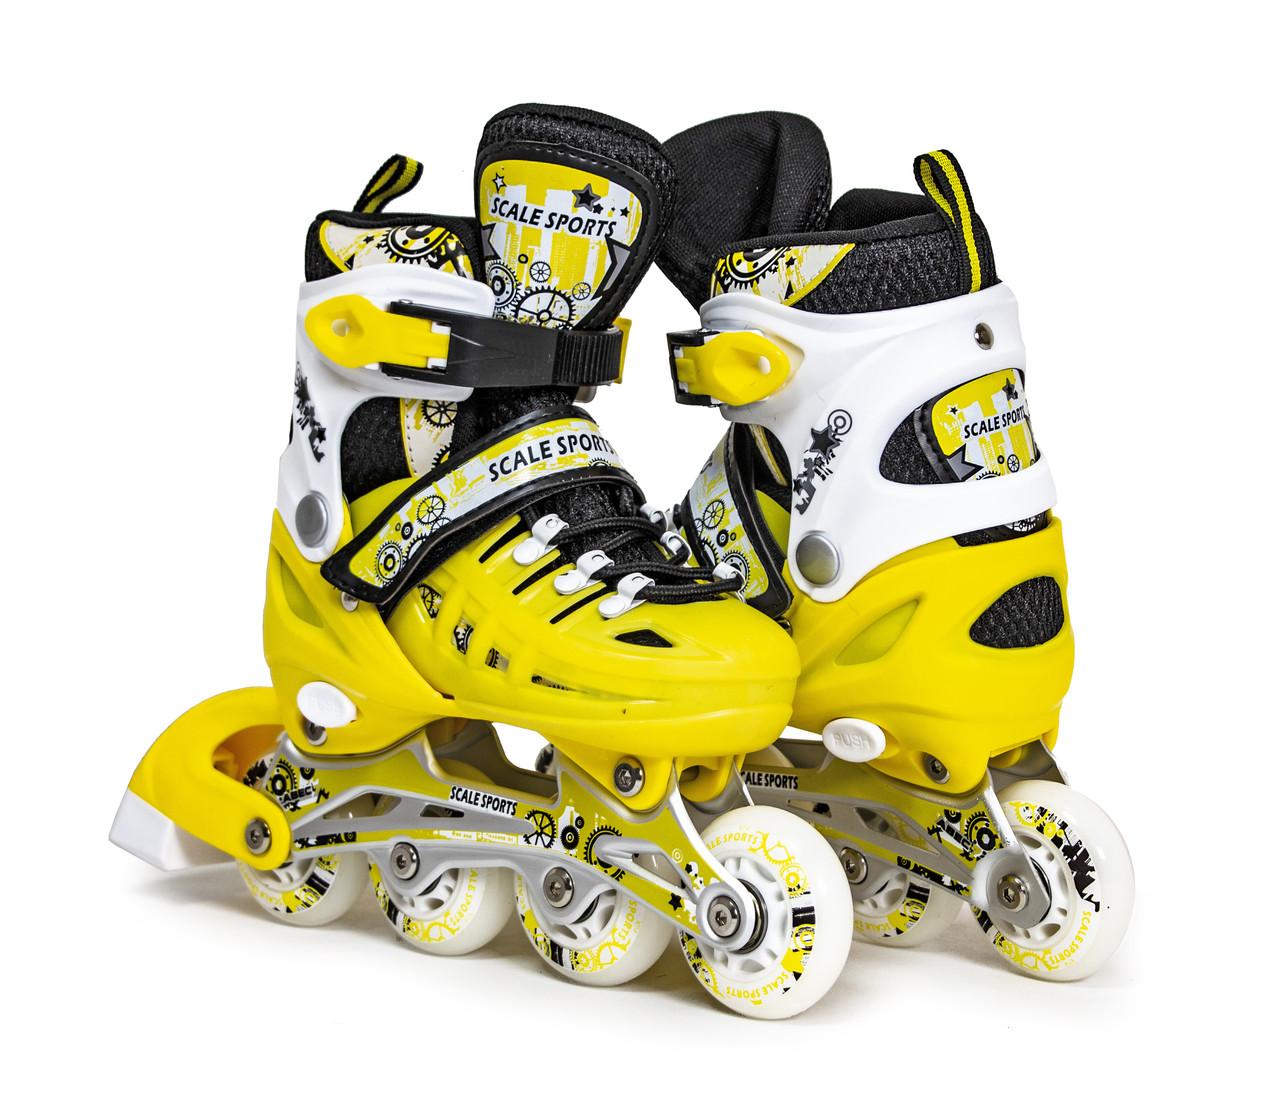 Ролики Scale Sports. Yellow LF 905, размер 38-41.